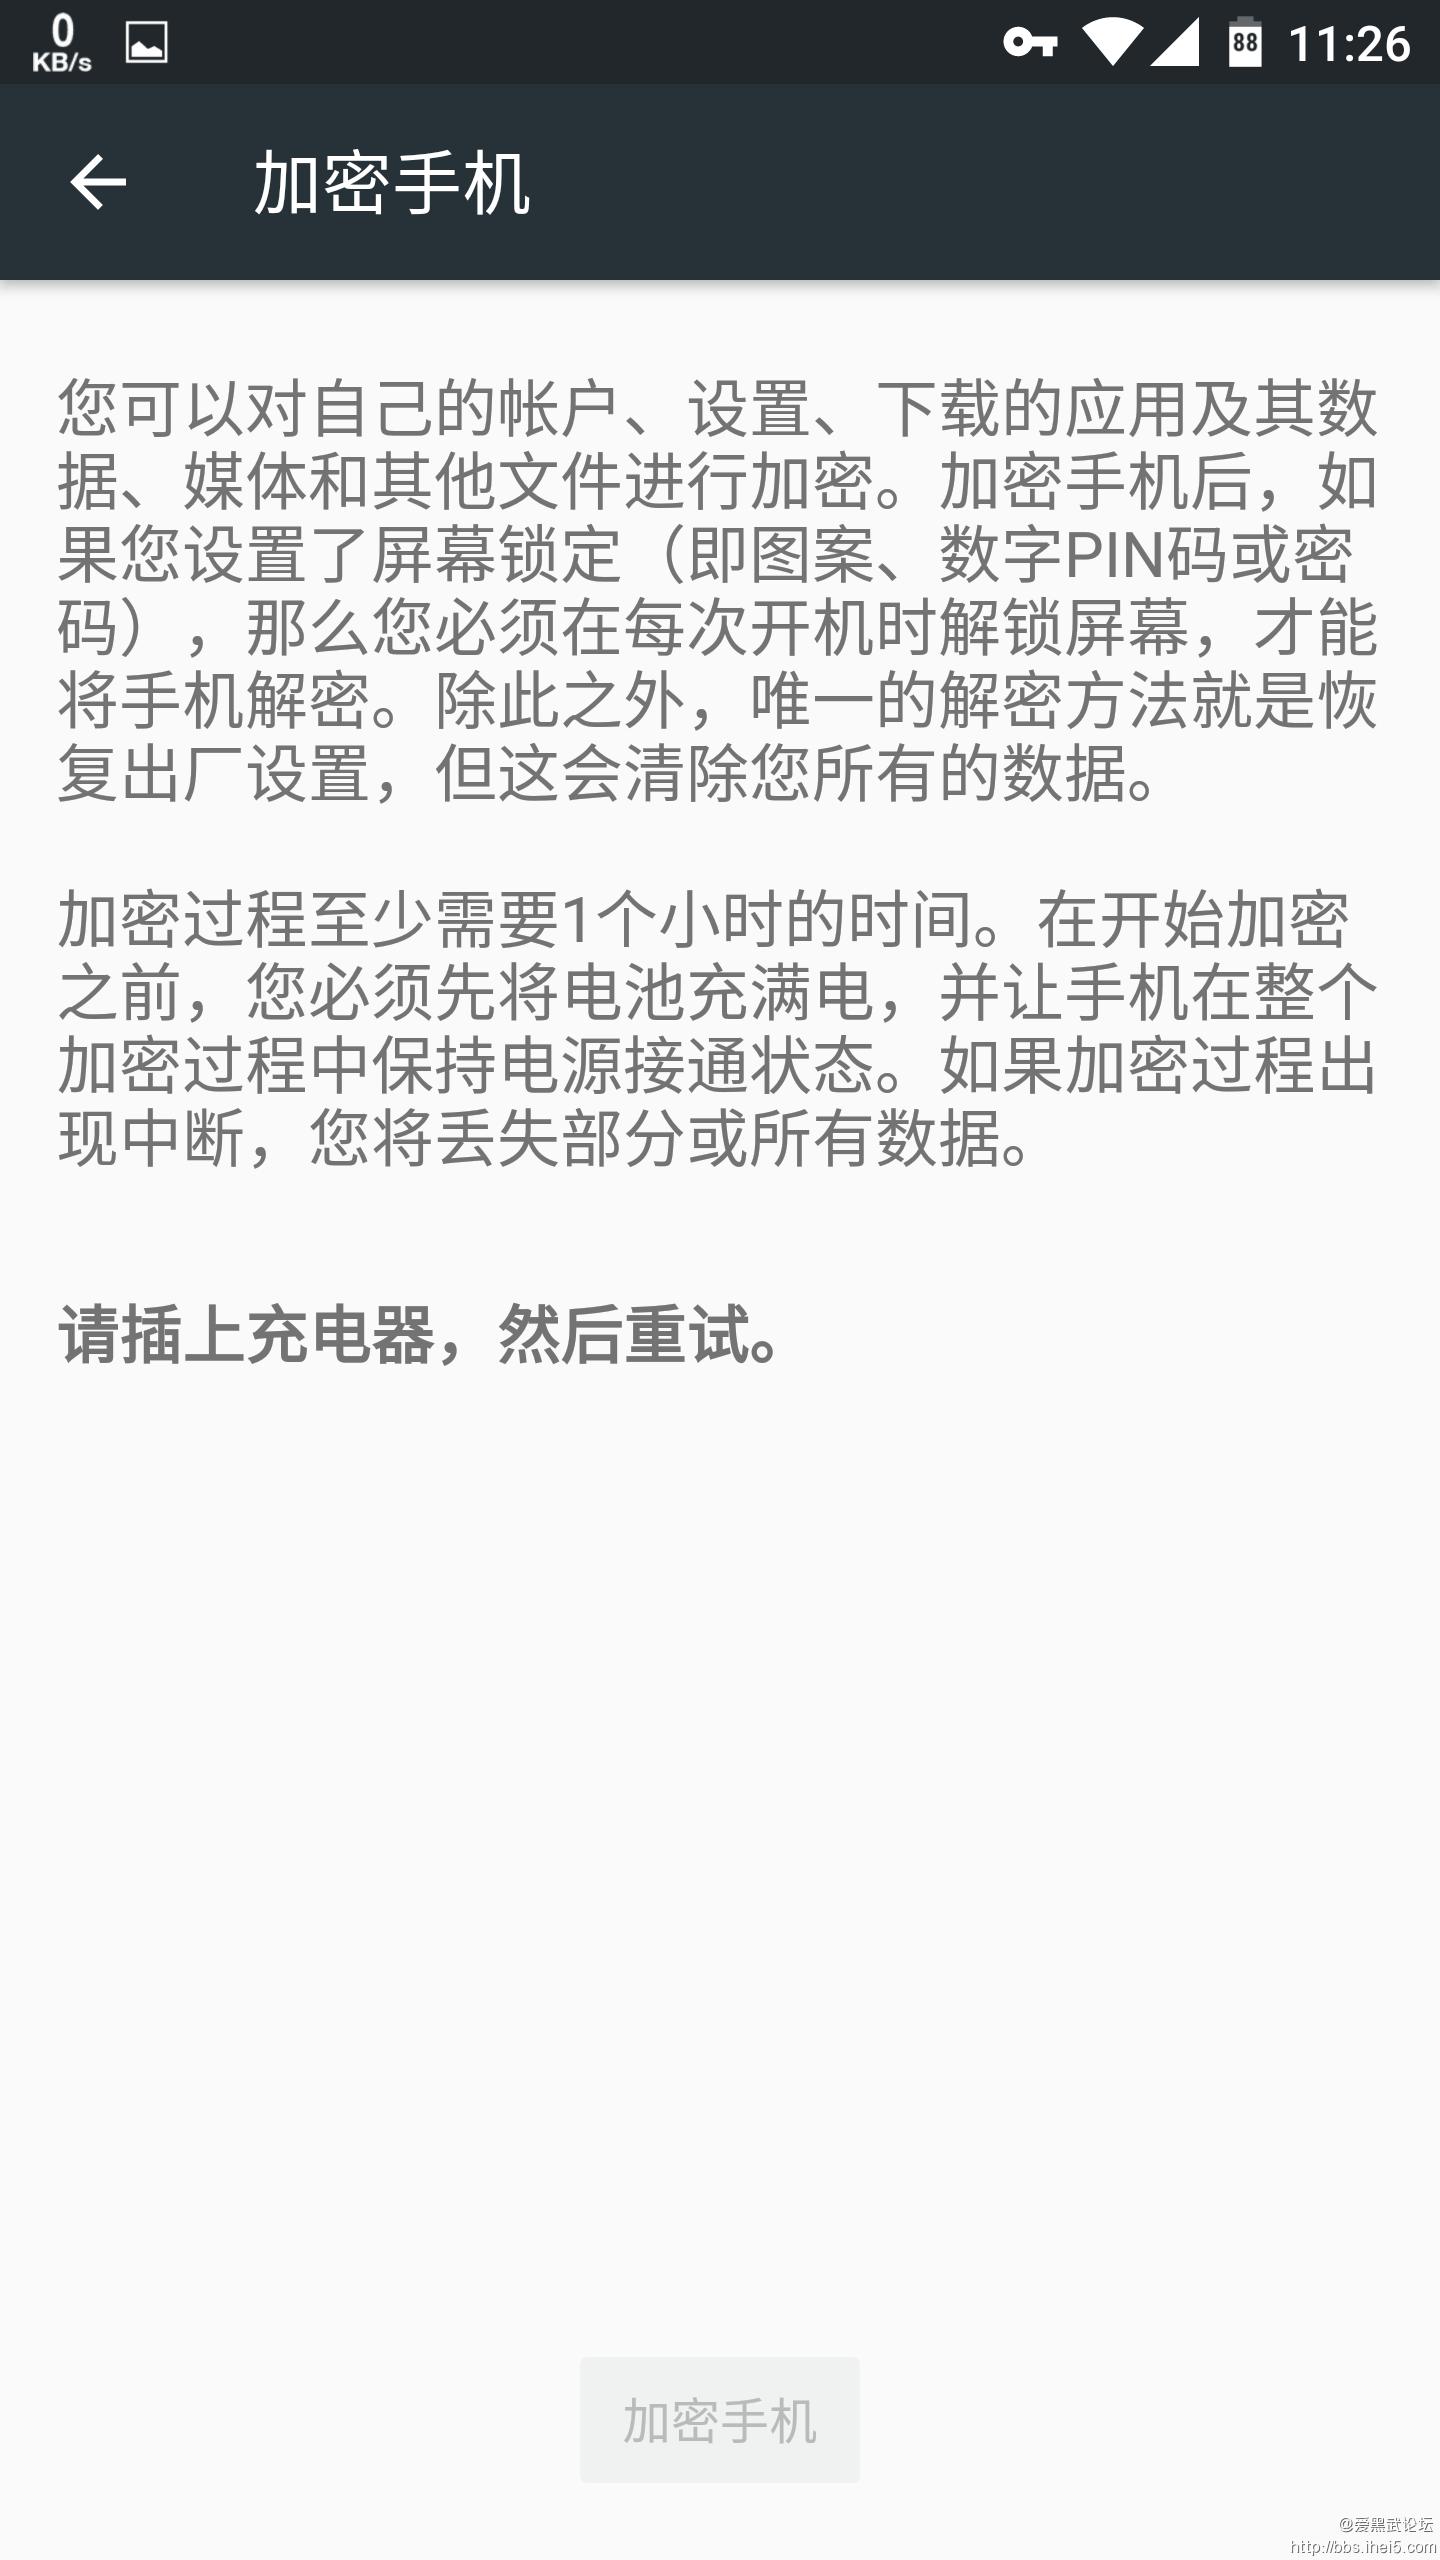 Screenshot_20160211-112602.png